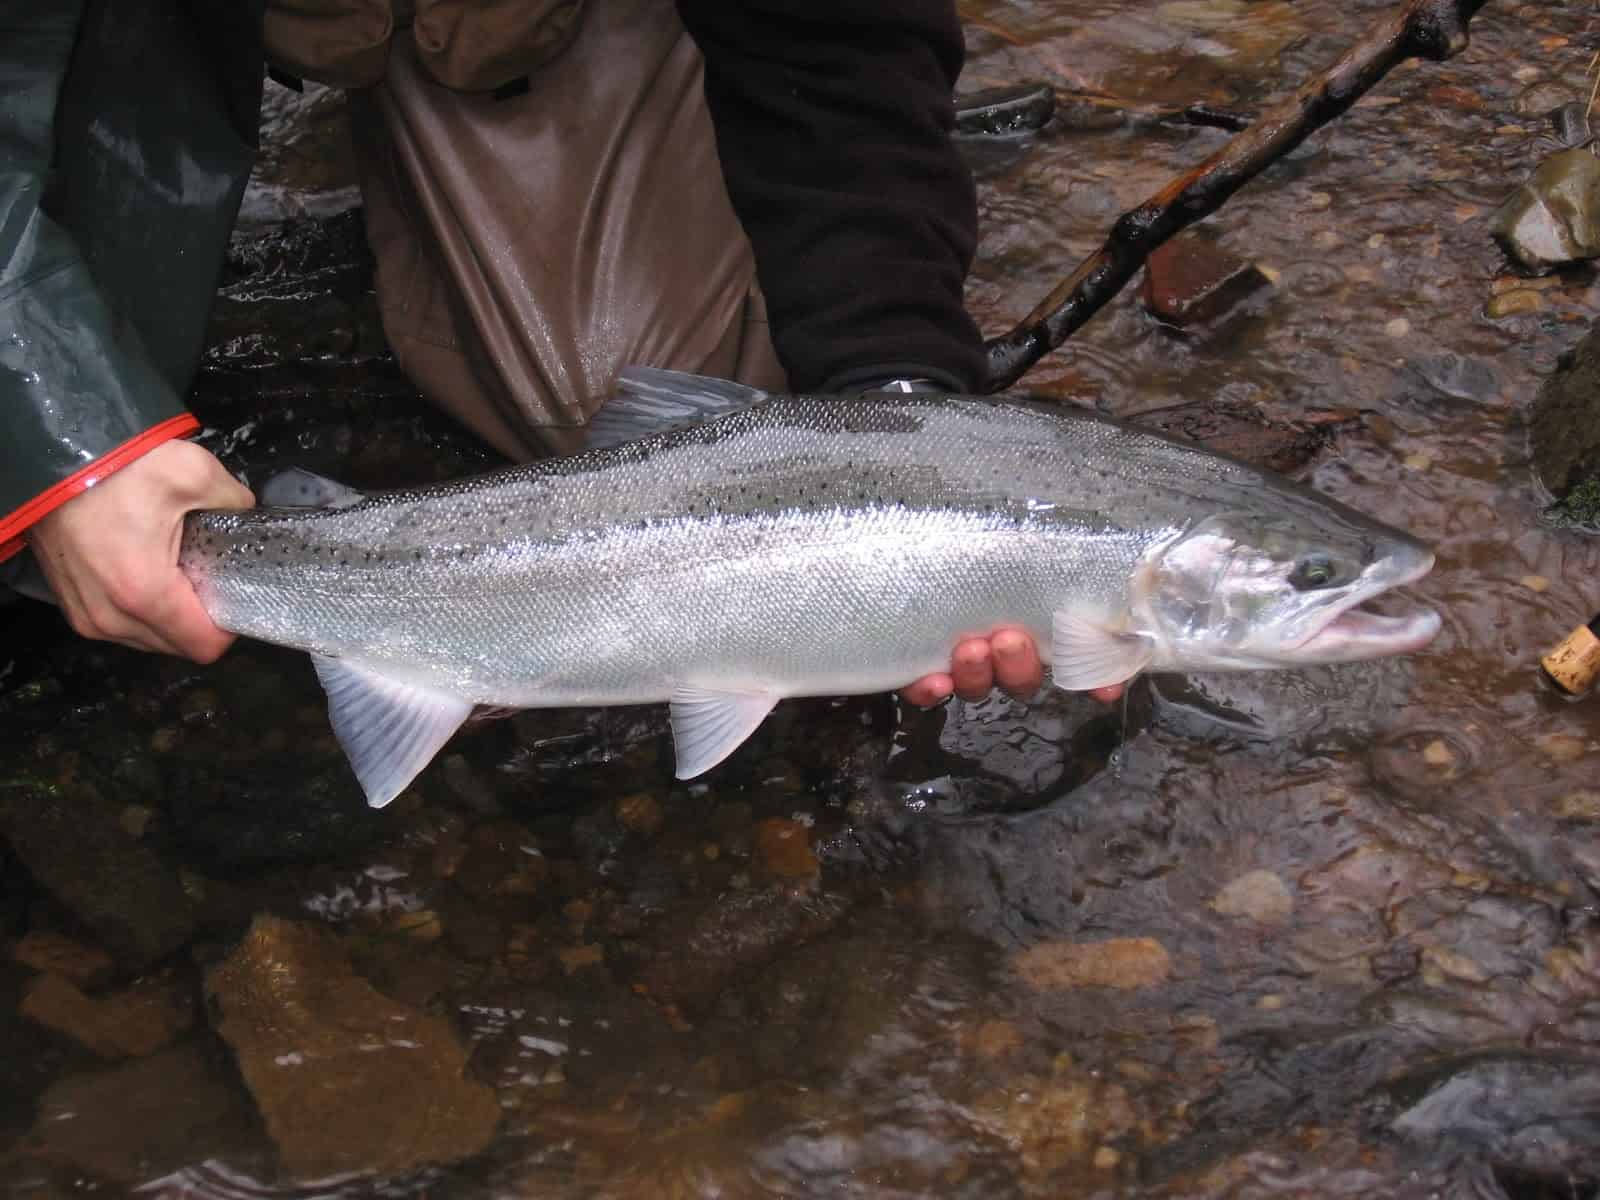 Steelhead Fishing 101: How to Catch Steelhead